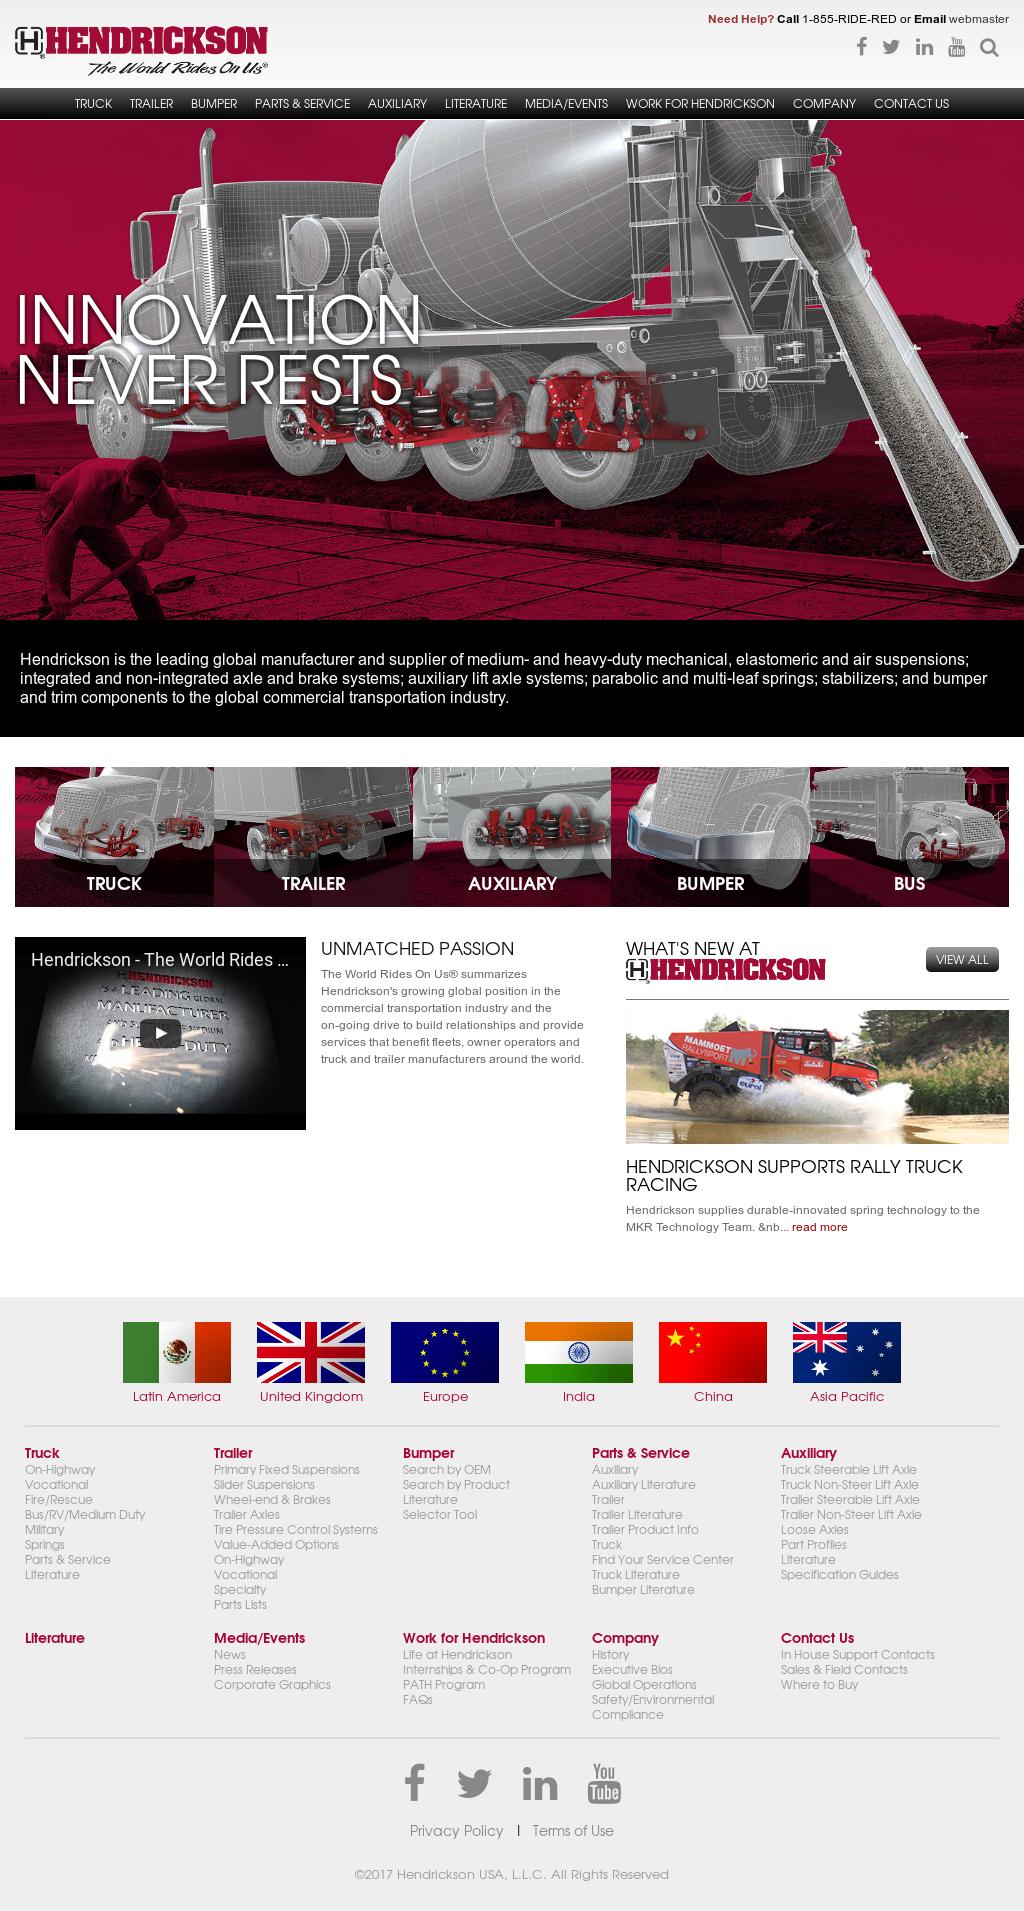 Hendrickson Competitors, Revenue and Employees - Owler Company Profile